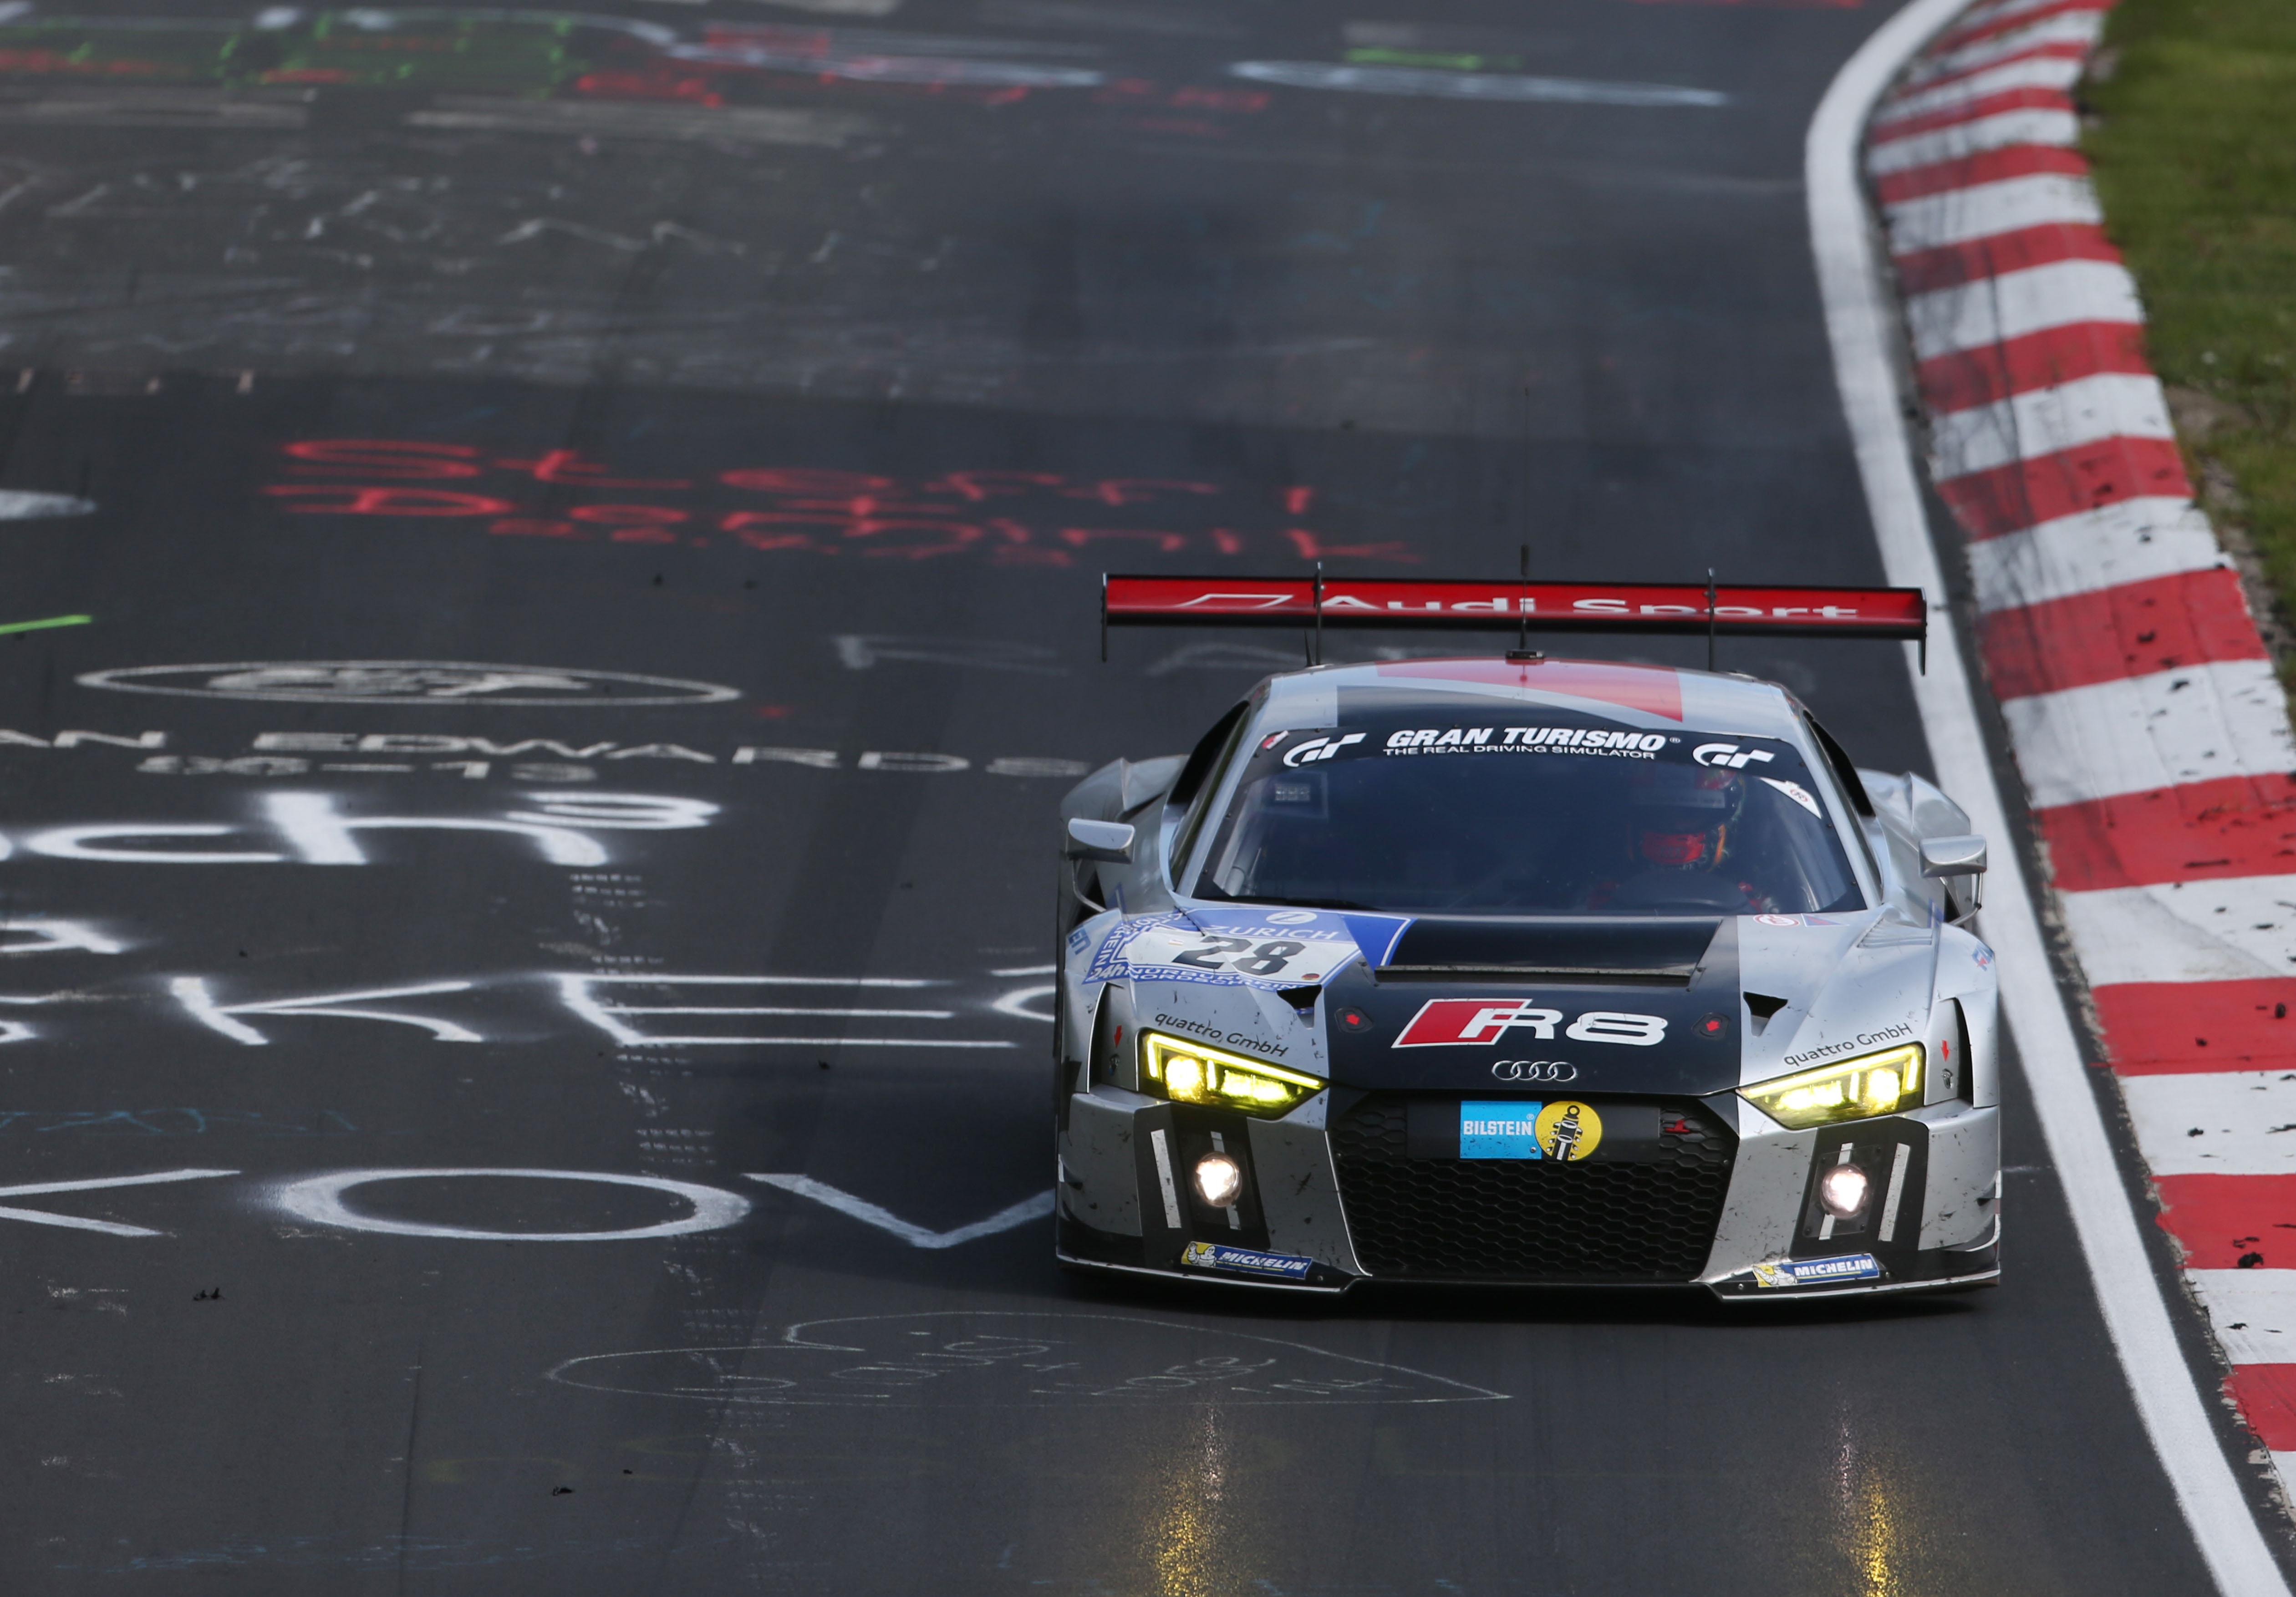 Audi _motorsport _150517-2899